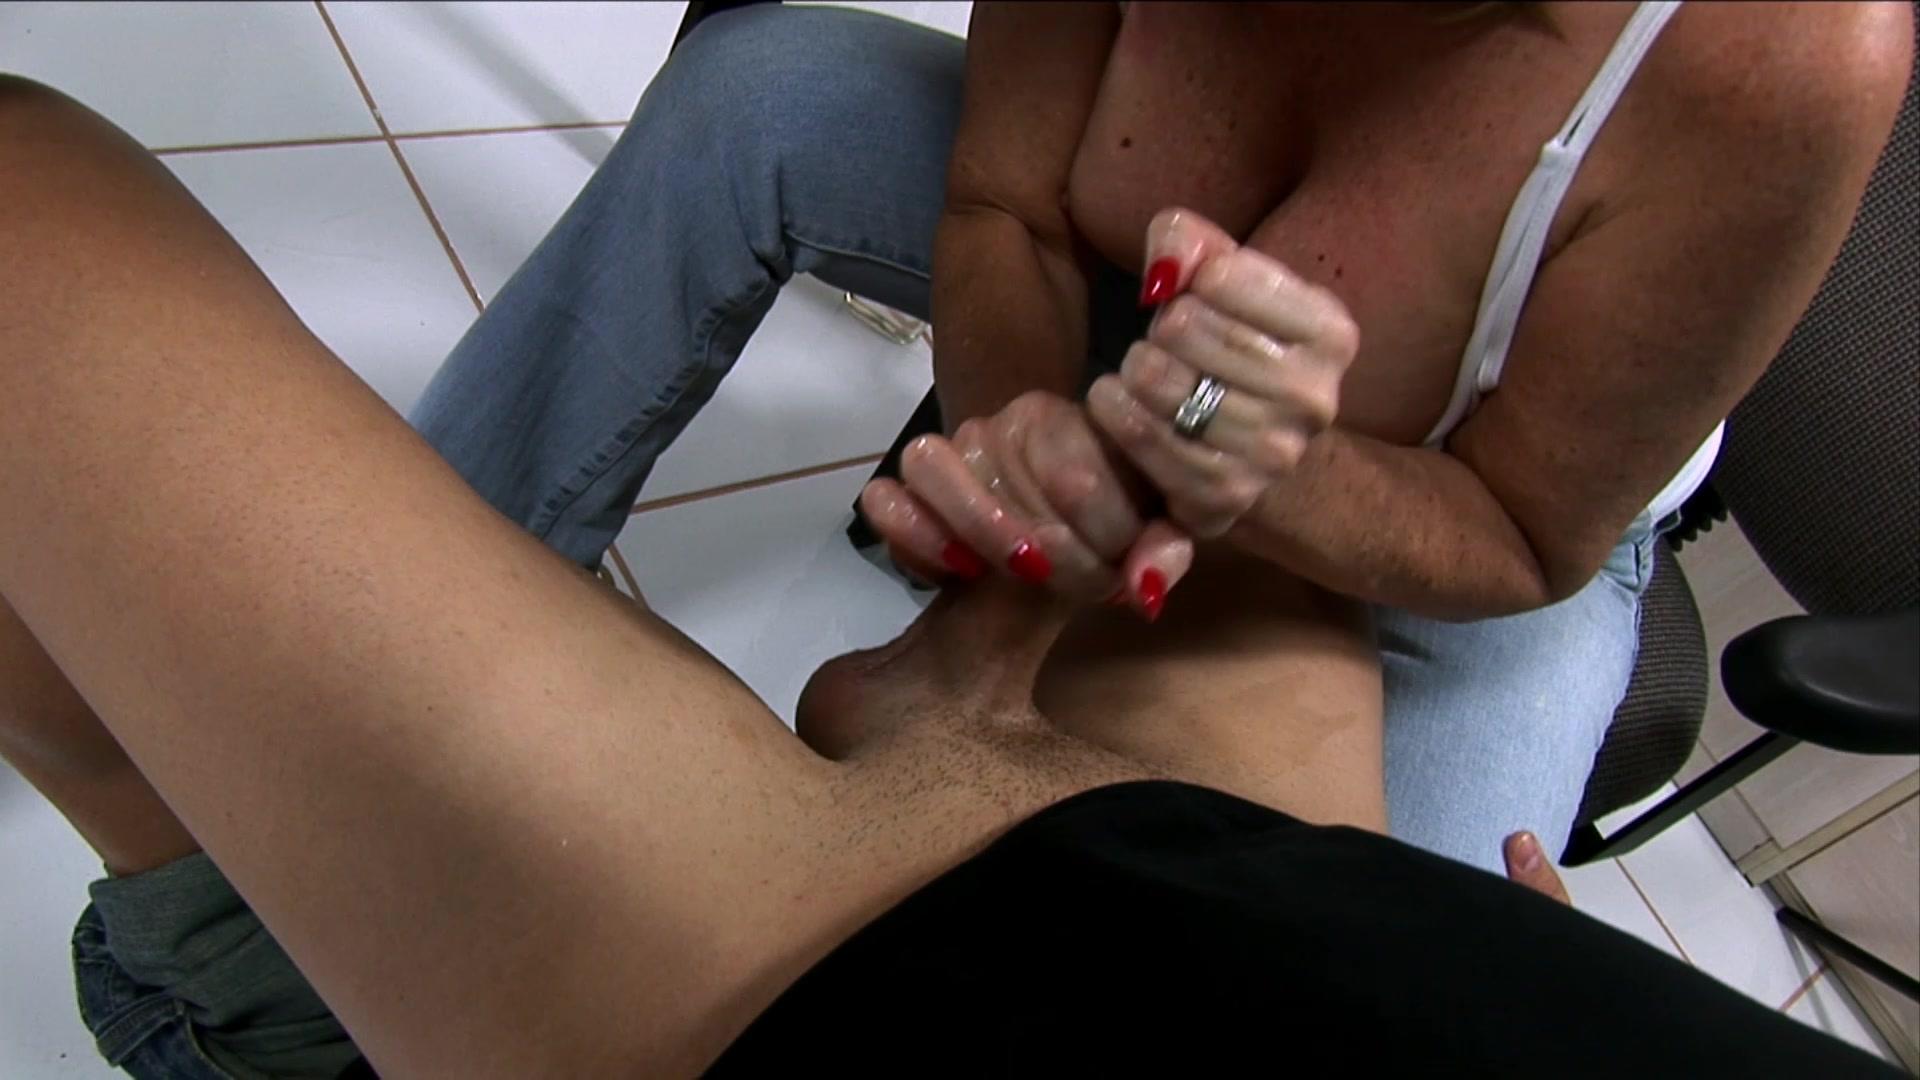 Surgical Nurse Handjob Porn Pics